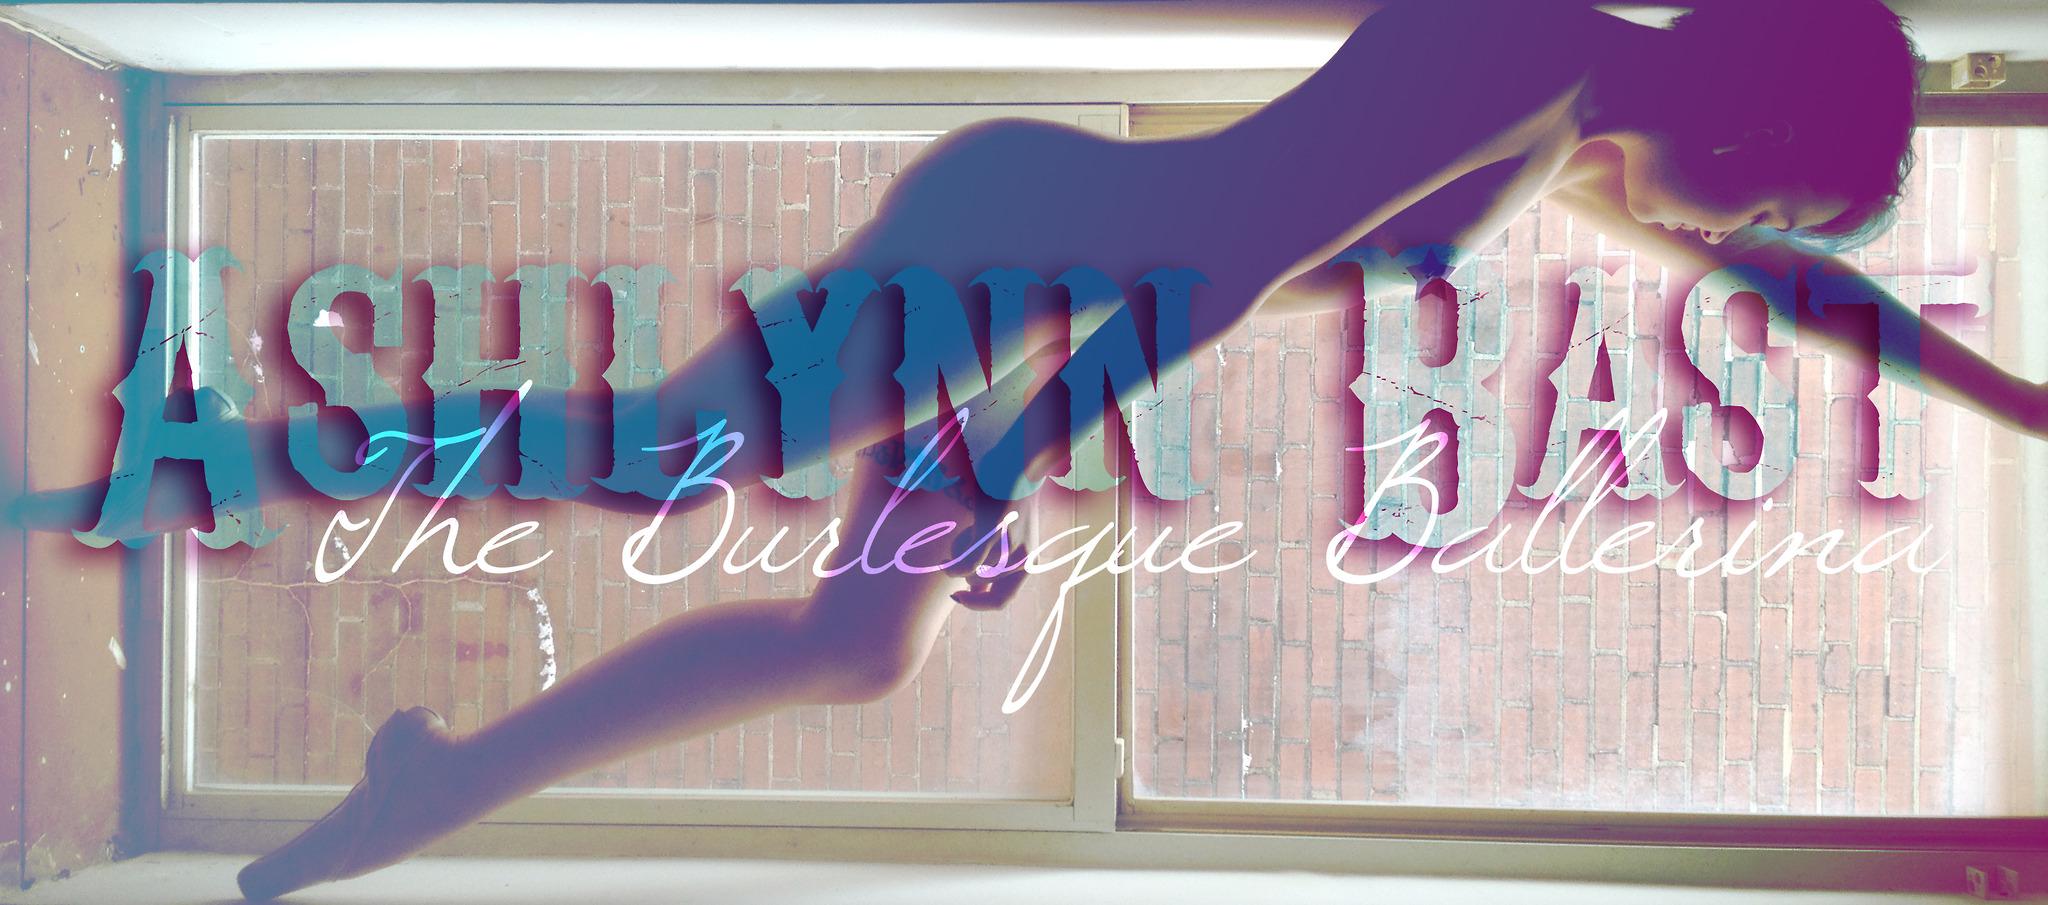 Ashlynn Bast: The Burlesque Ballerina